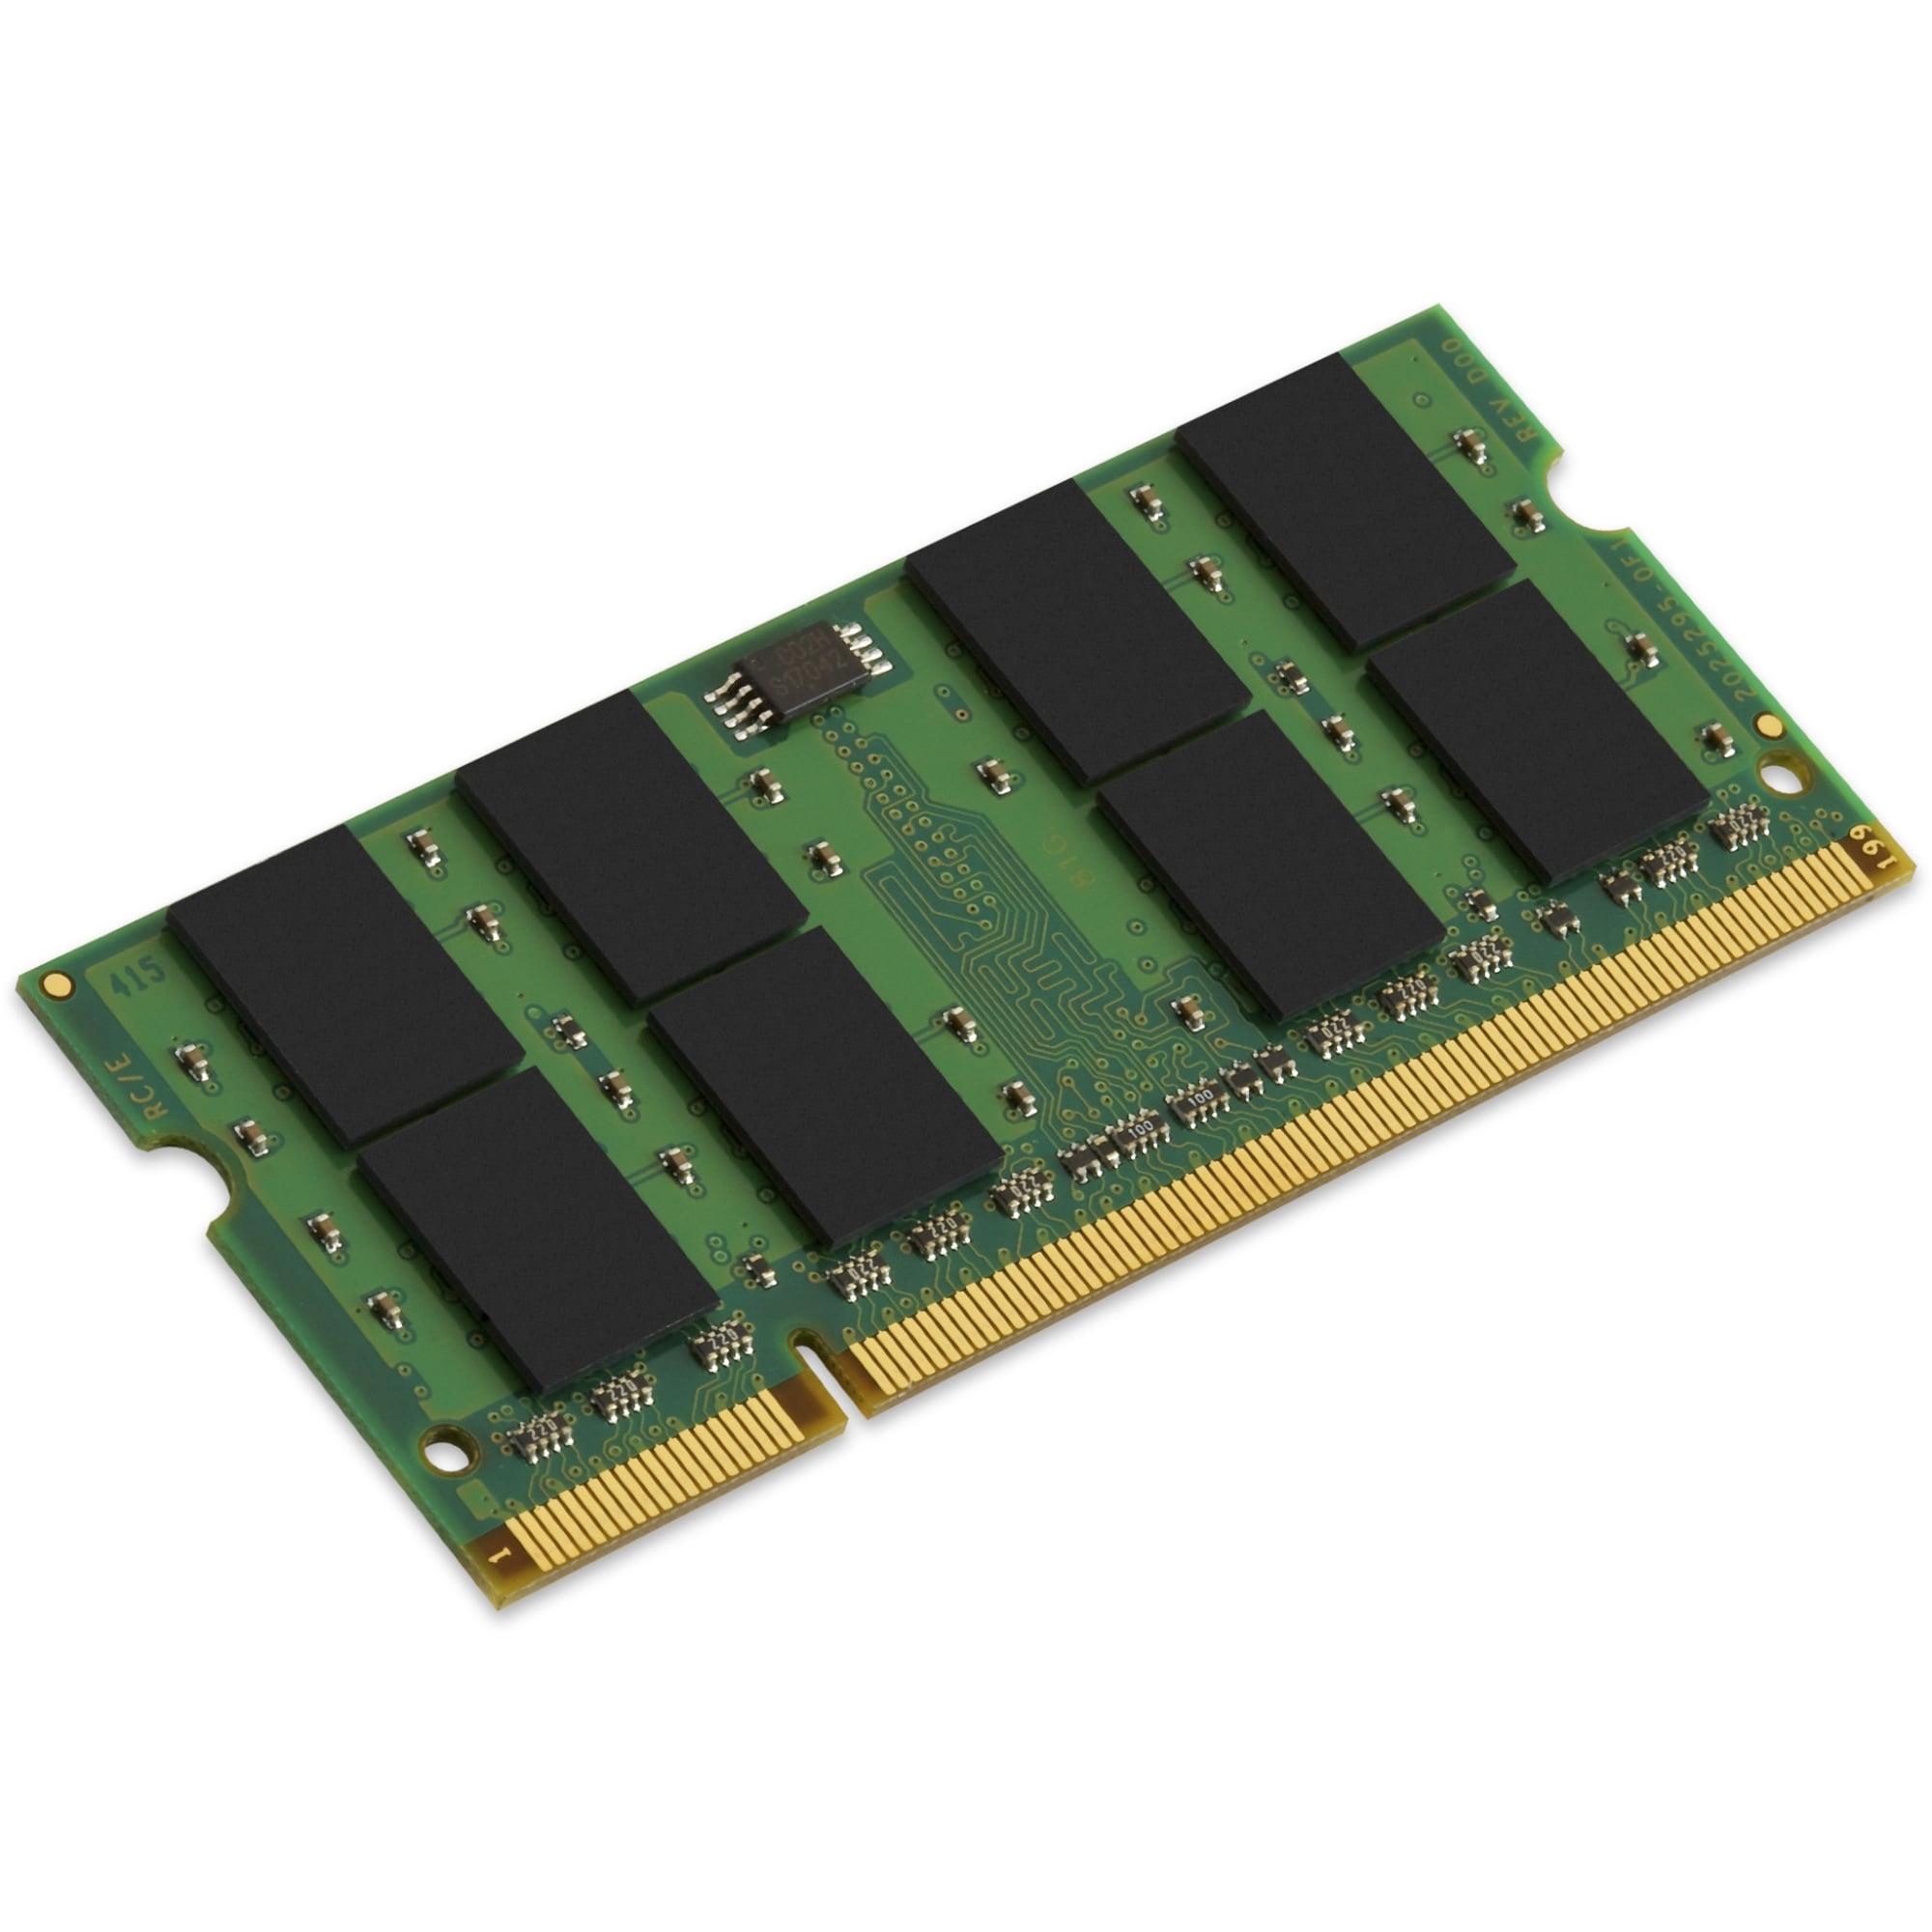 KINGSTON TECHNOLOGY DT & NOTEBOOKS  KTD-INSP6000C/2G     2GB DDR2 800MHZ